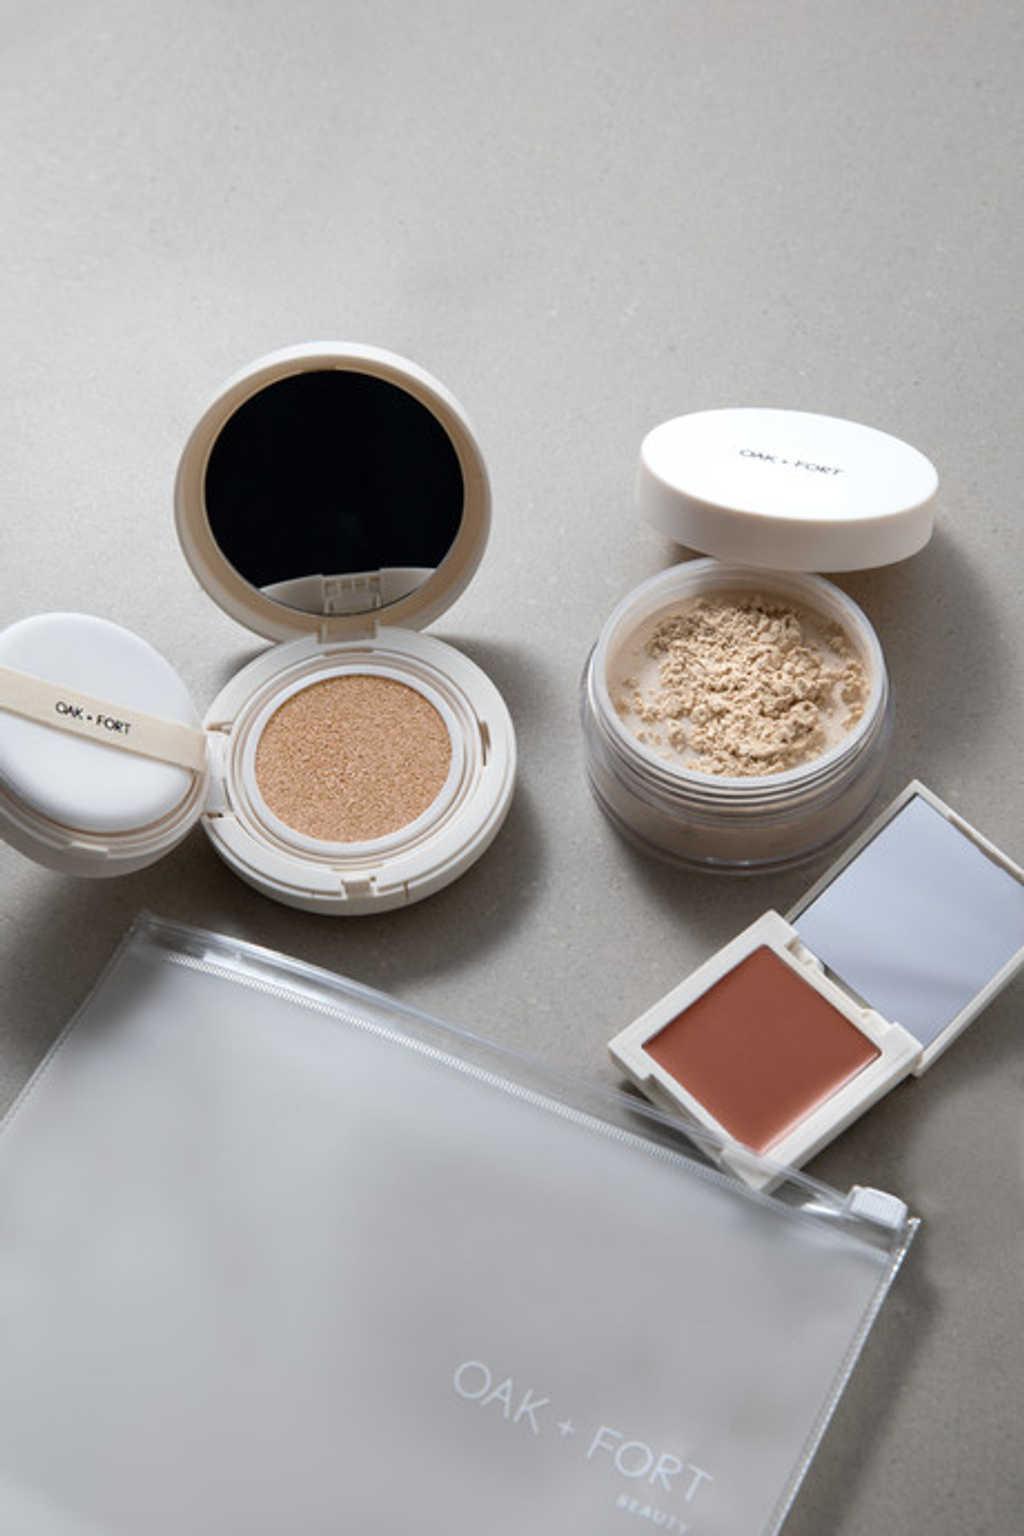 Glow Collection Ecru Clay default 1